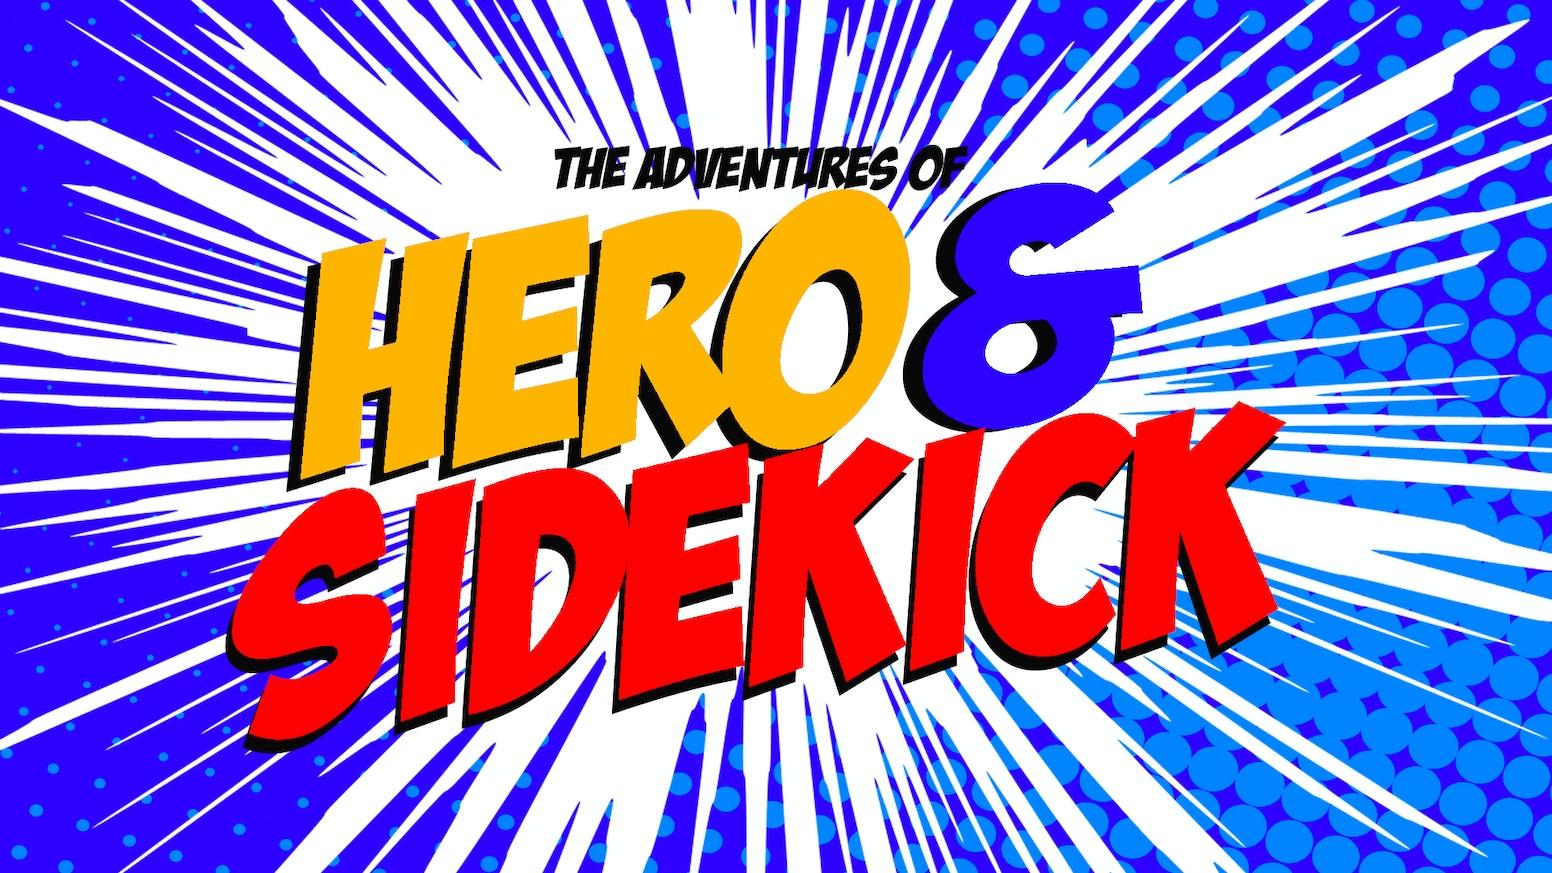 RETIRED SUPERHERO COMEDY WEBSERIES - Hero and Sidekick by John